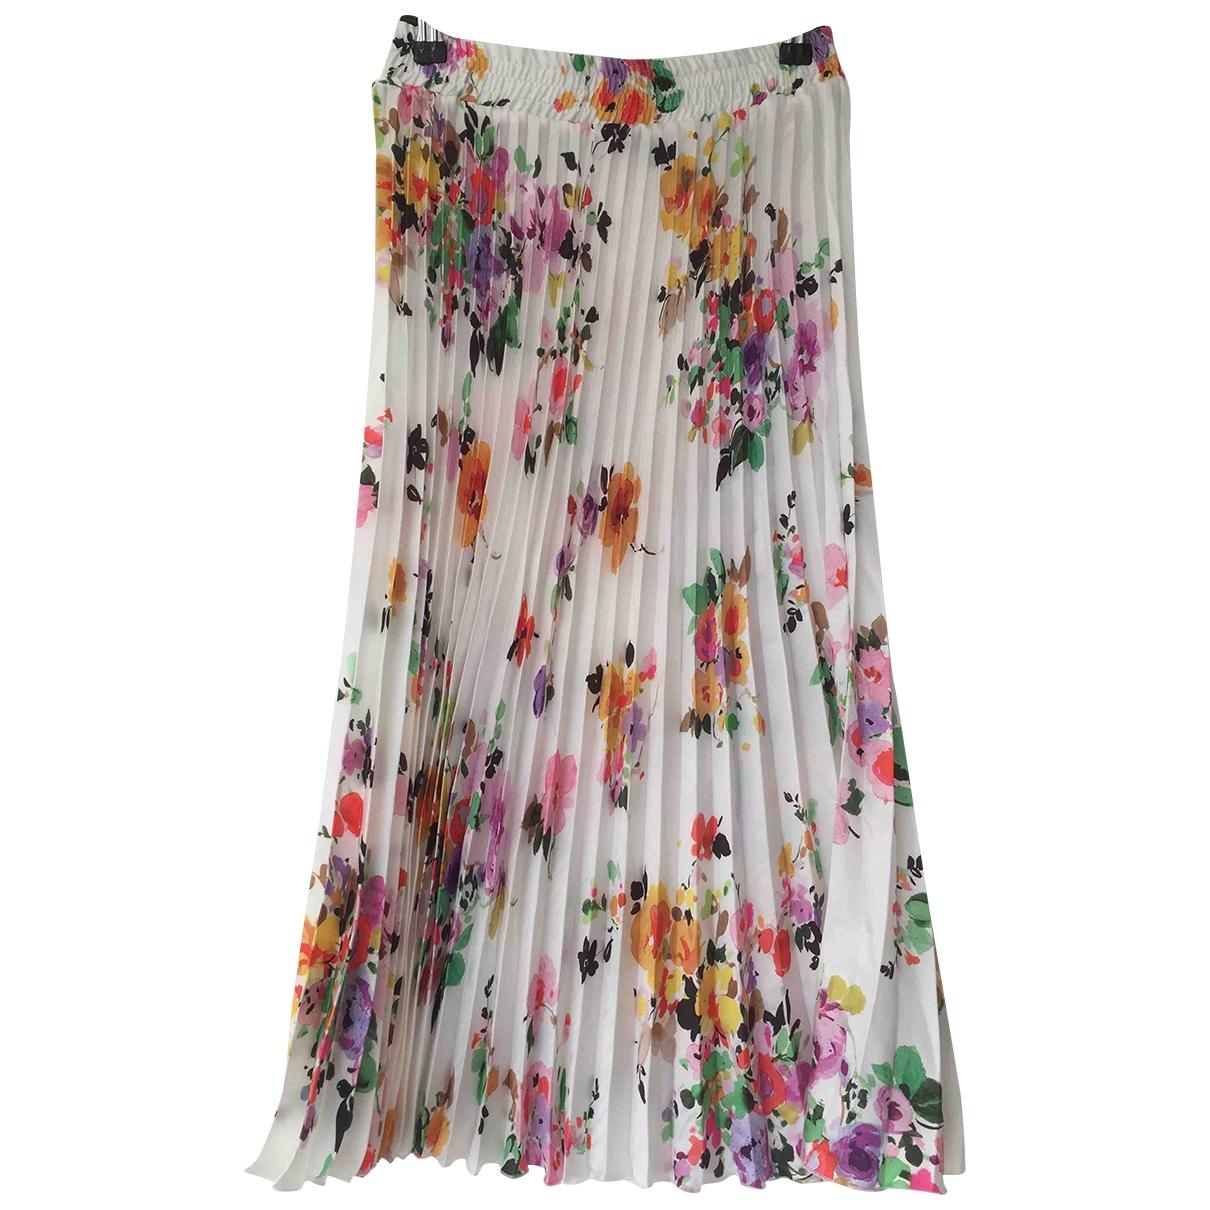 Zara - Jupe   pour femme - multicolore